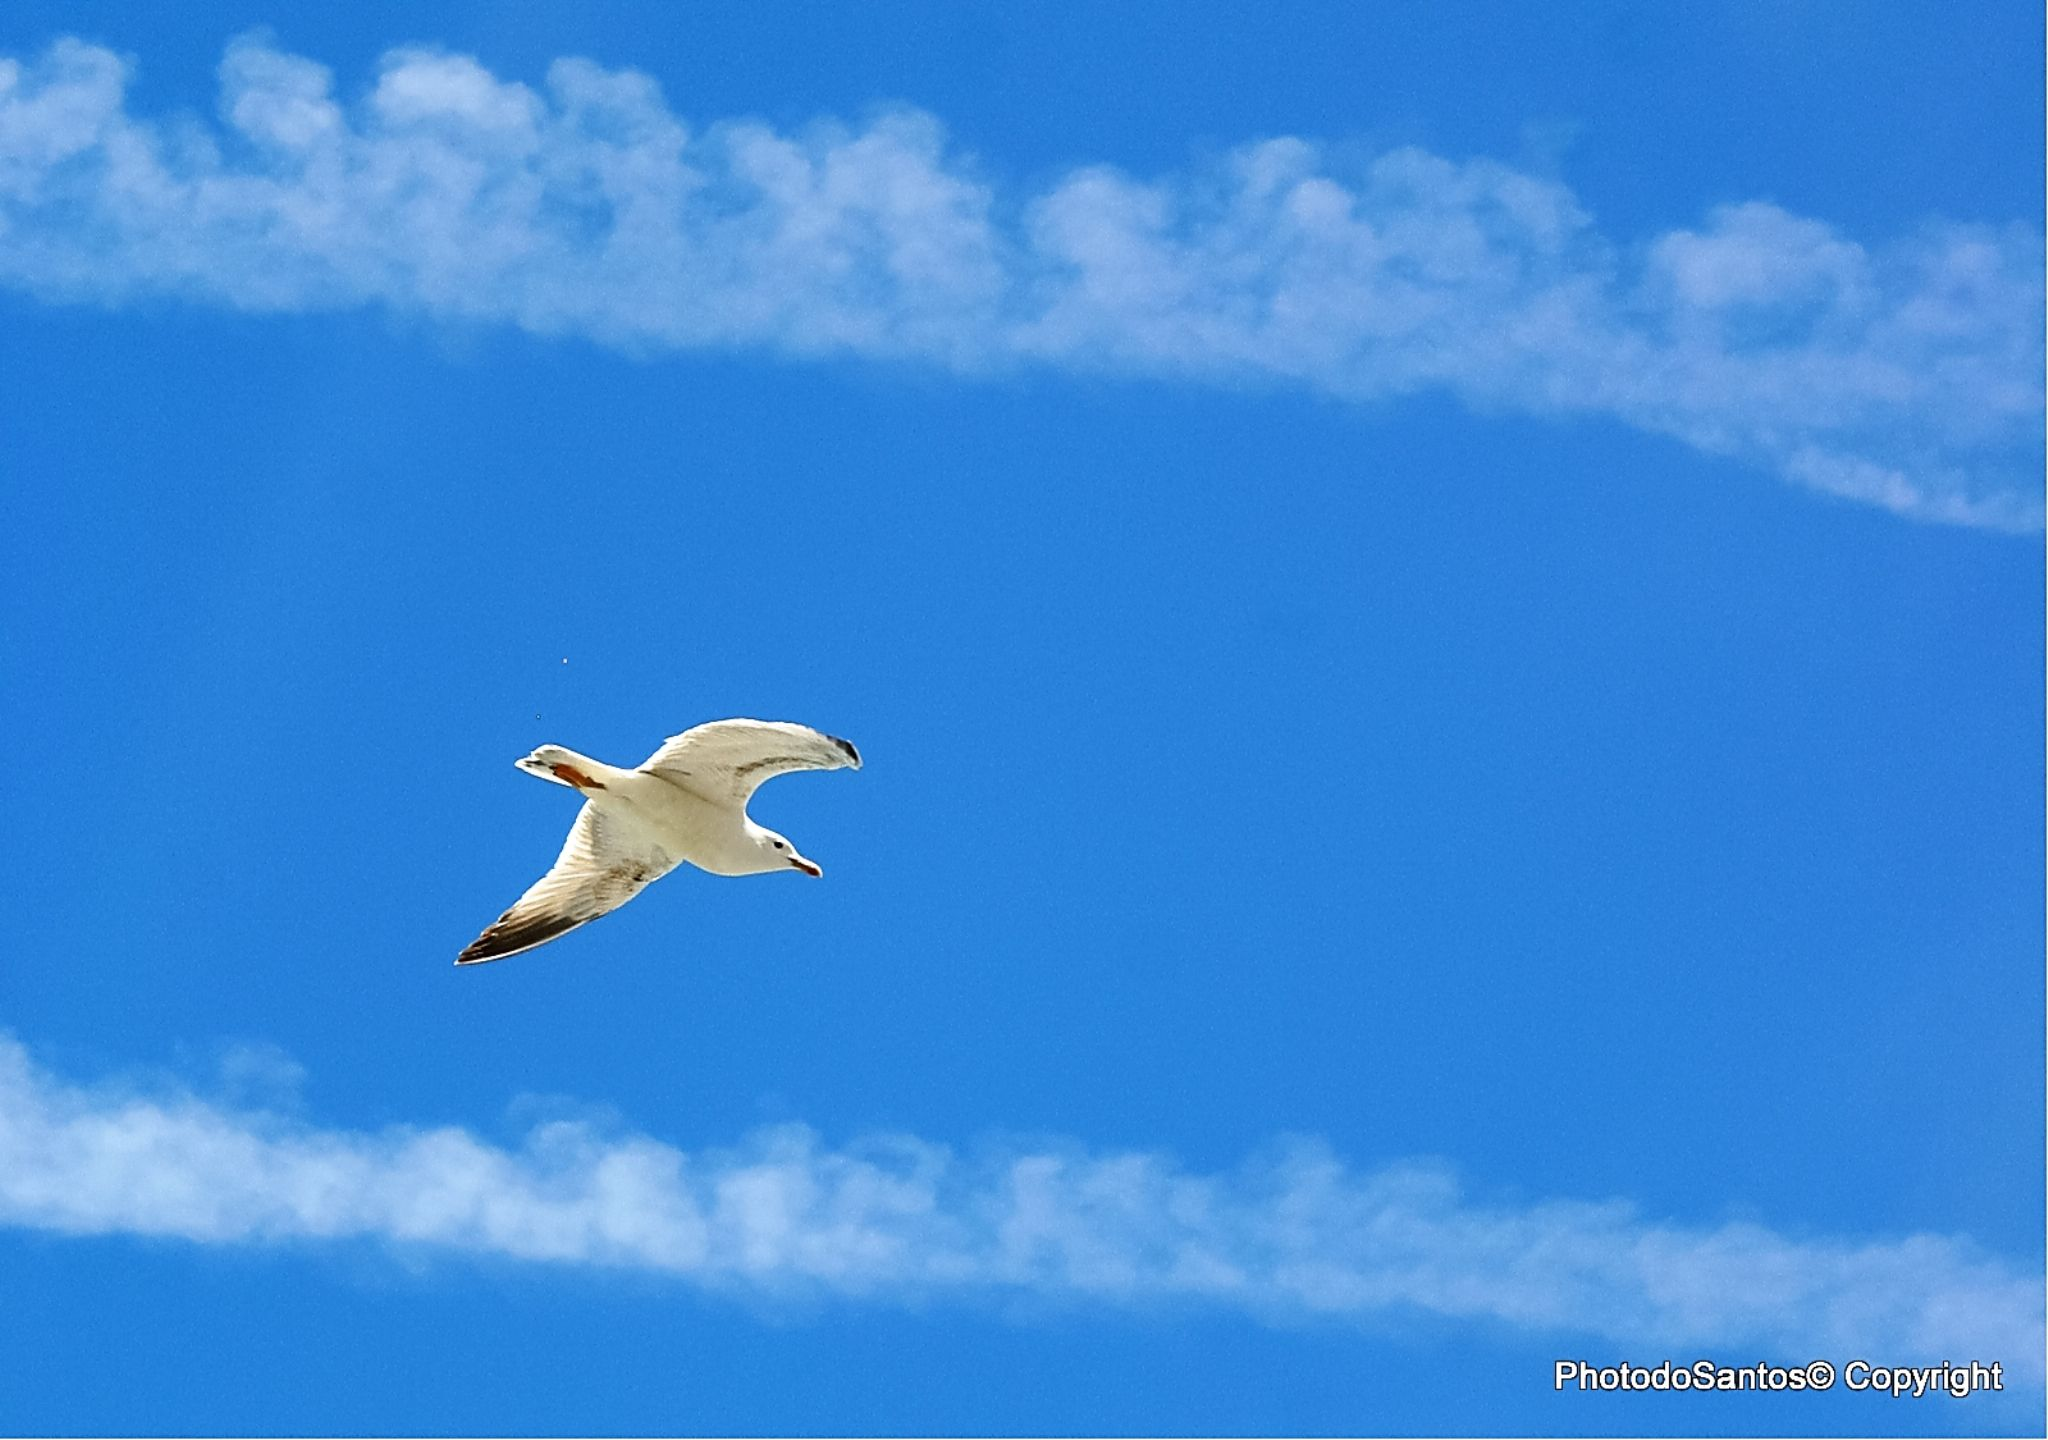 Autoroute sky by Ricardo Santos